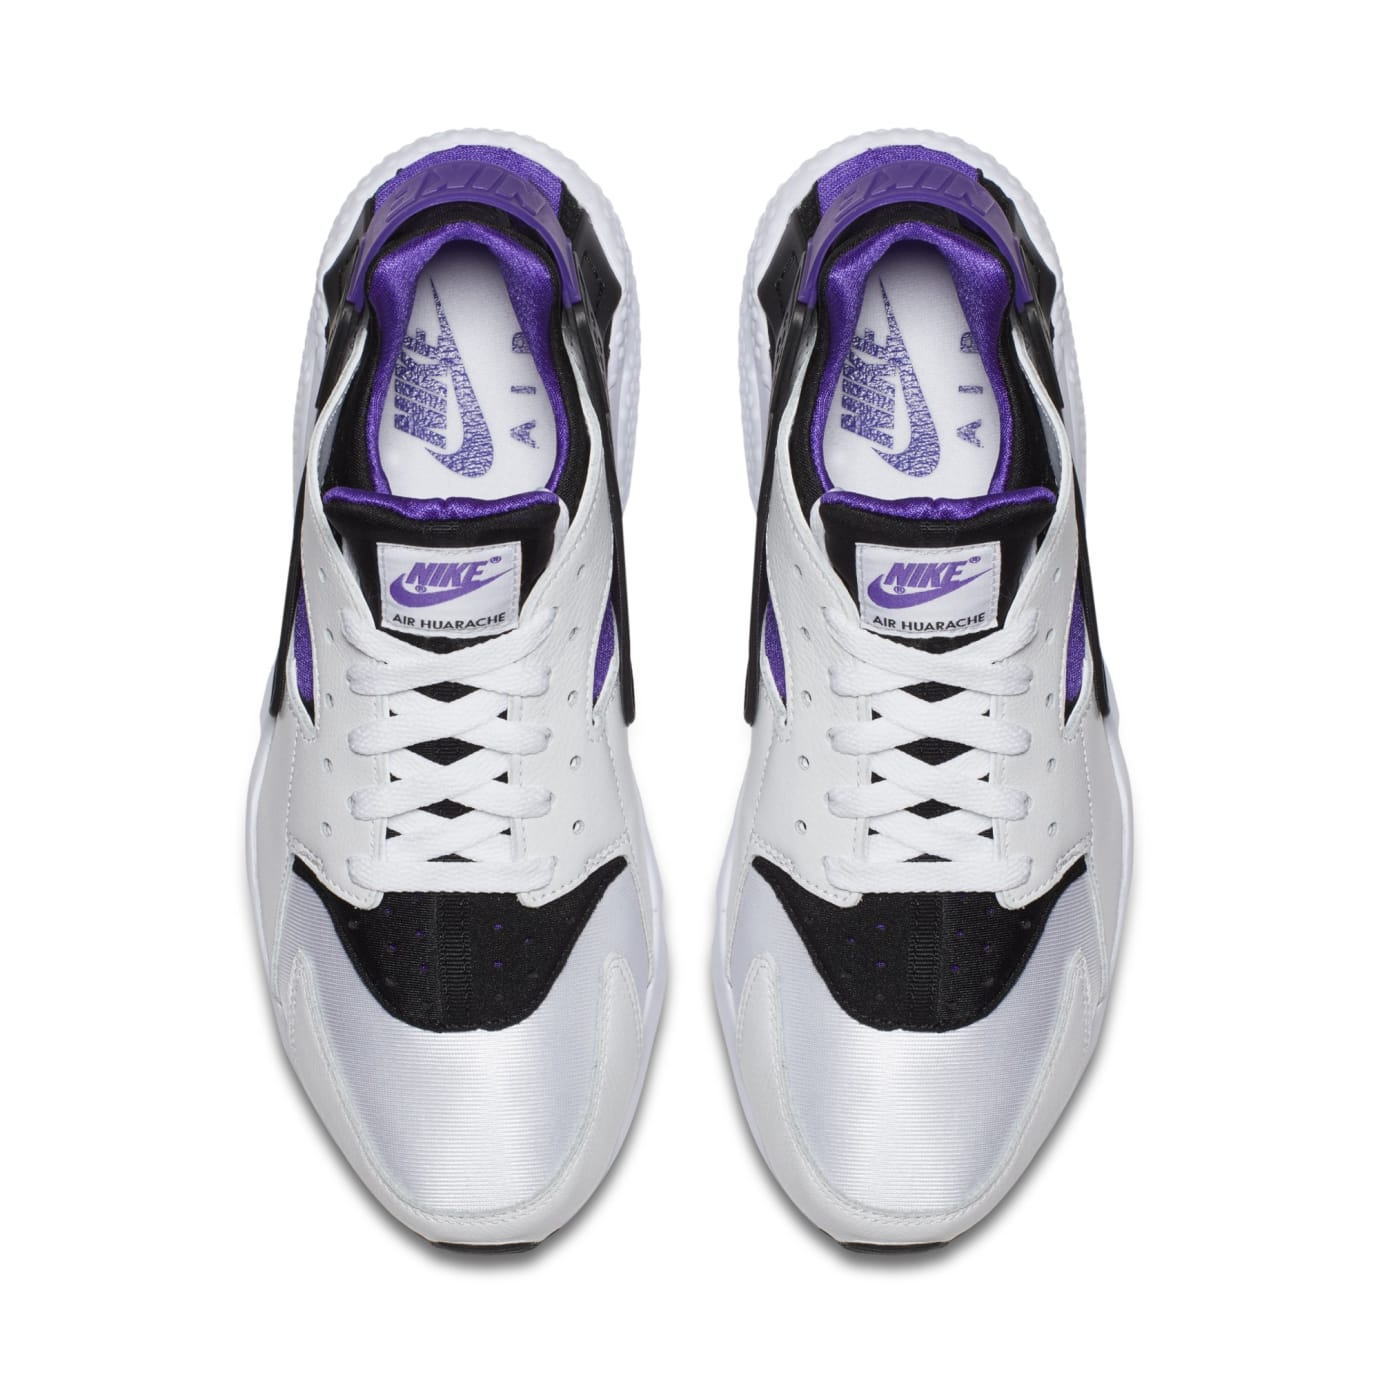 Nike Air Huarache '91 'Purple Punch' AH8049-001 Release Date ...